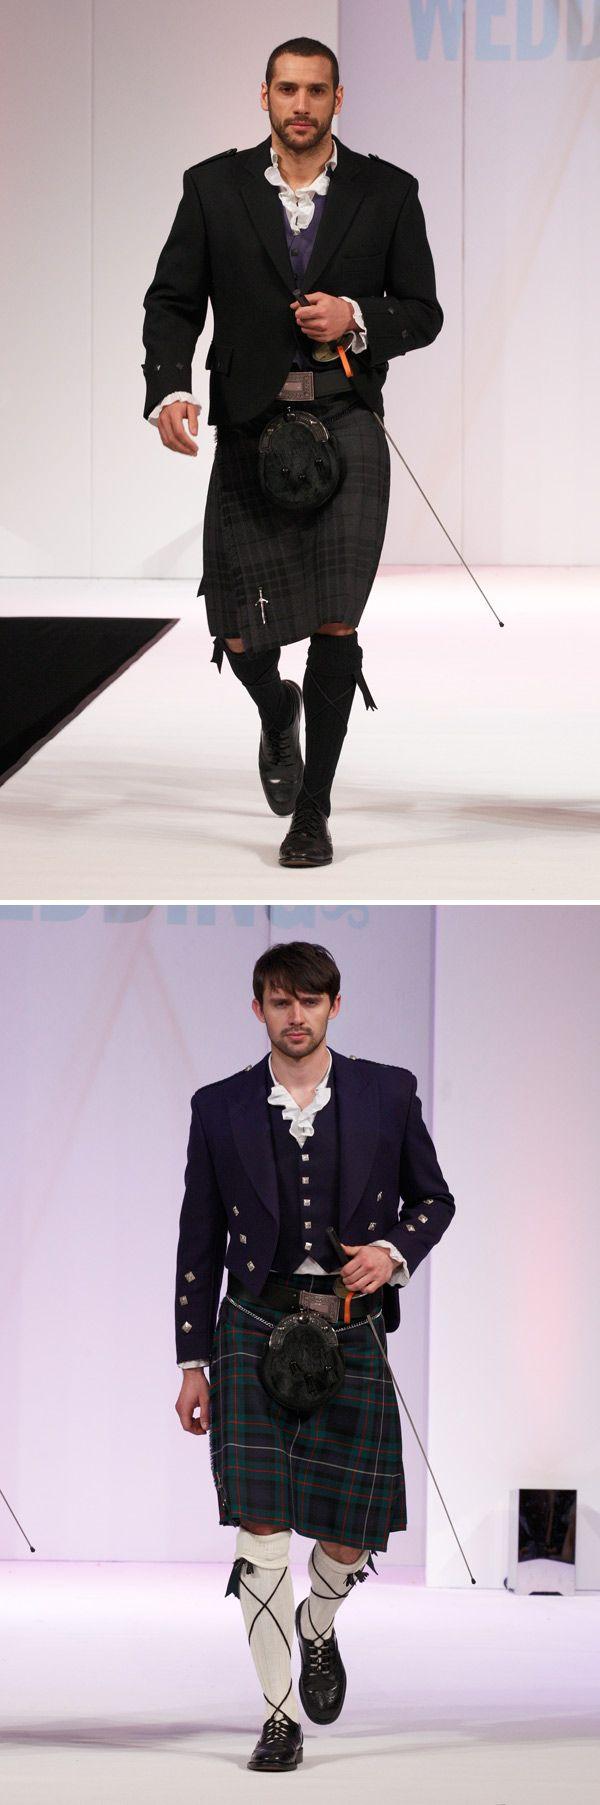 Hot men in kilts A Fashion Forward Friday.